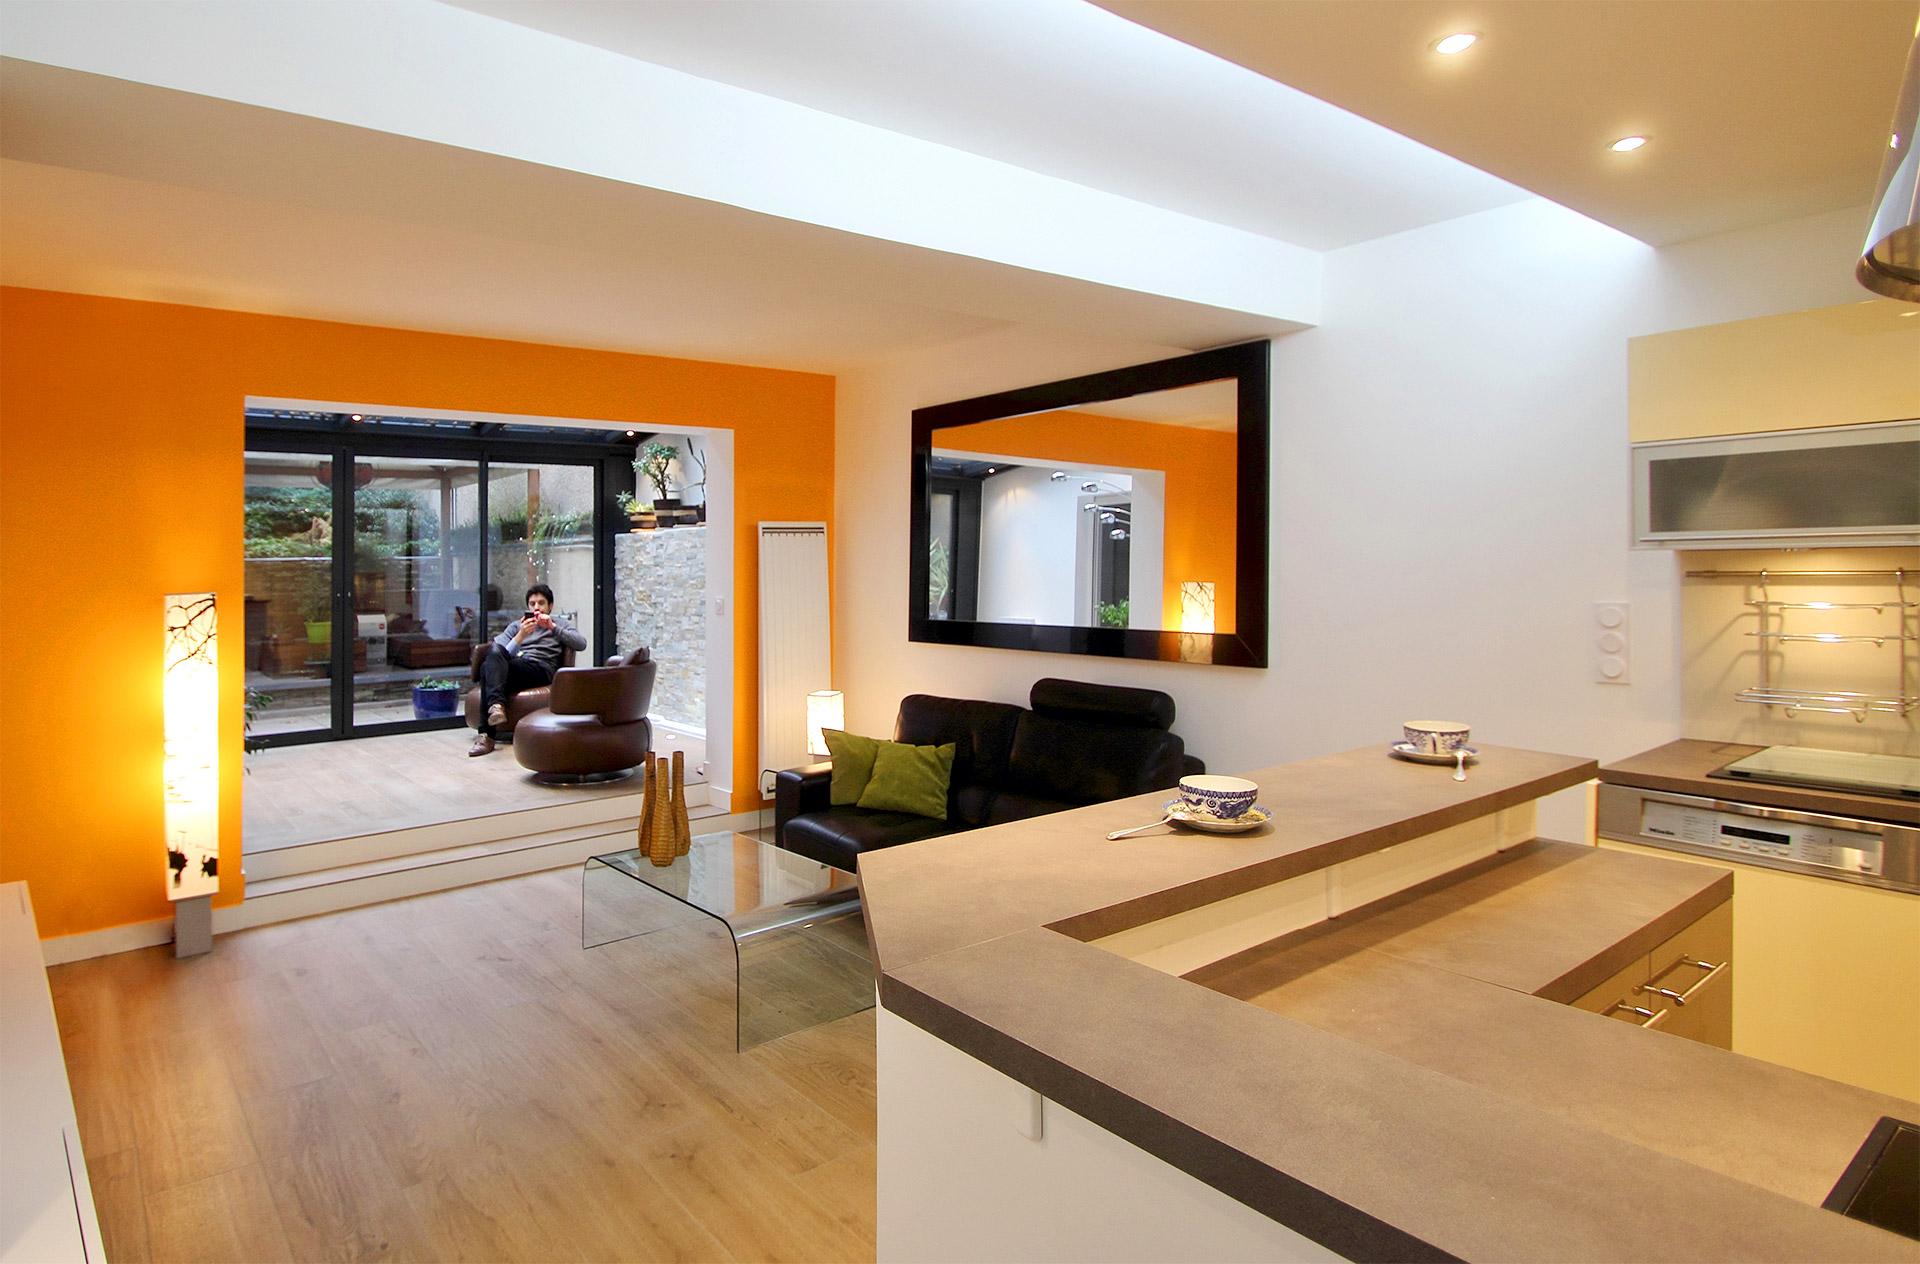 rideau pour veranda pas cher veranda. Black Bedroom Furniture Sets. Home Design Ideas